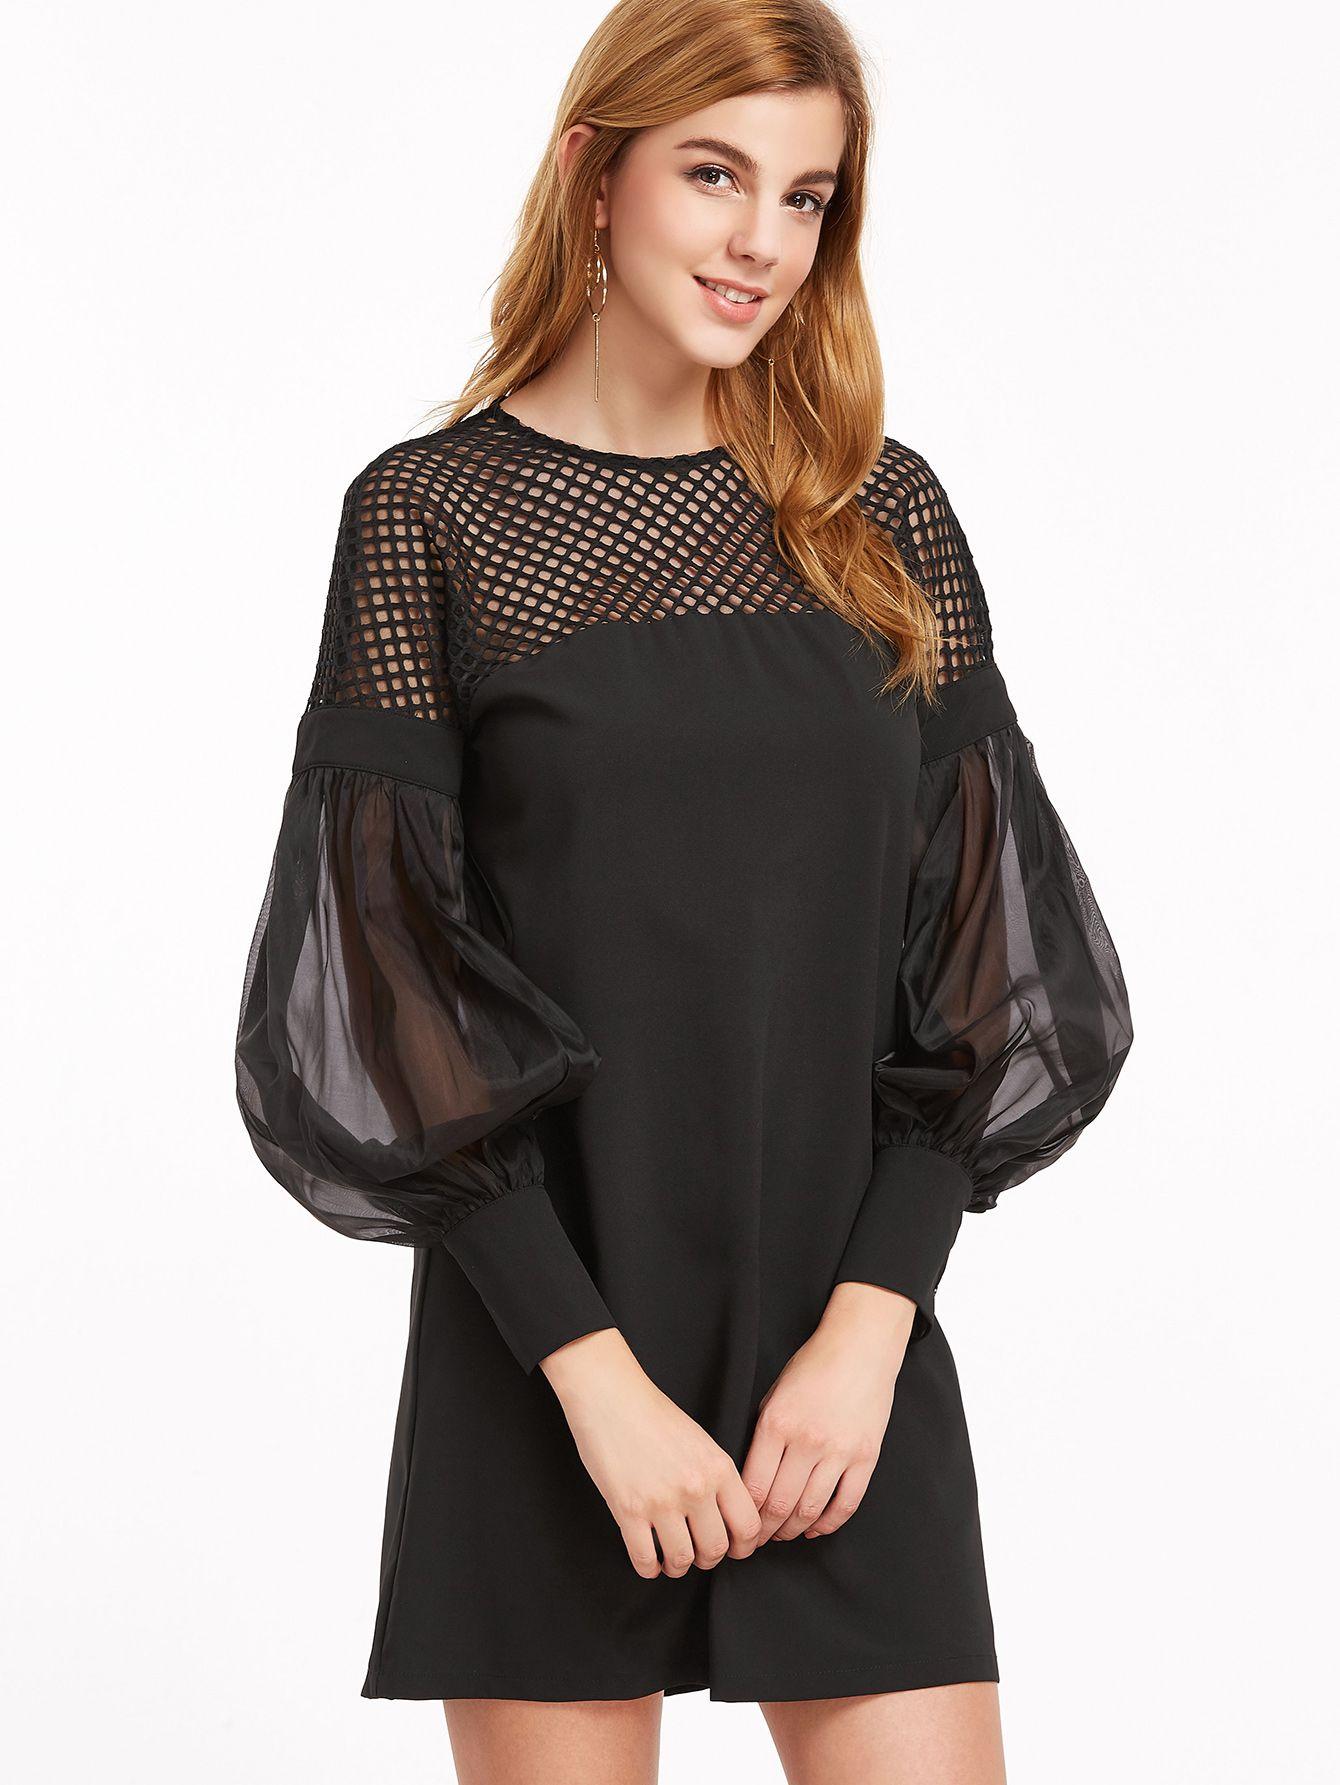 Black Eyelet Mesh Shoulder Sheer Bishop Sleeve Dress Fashion Outfits Fashion African Fashion Dresses [ 1785 x 1340 Pixel ]